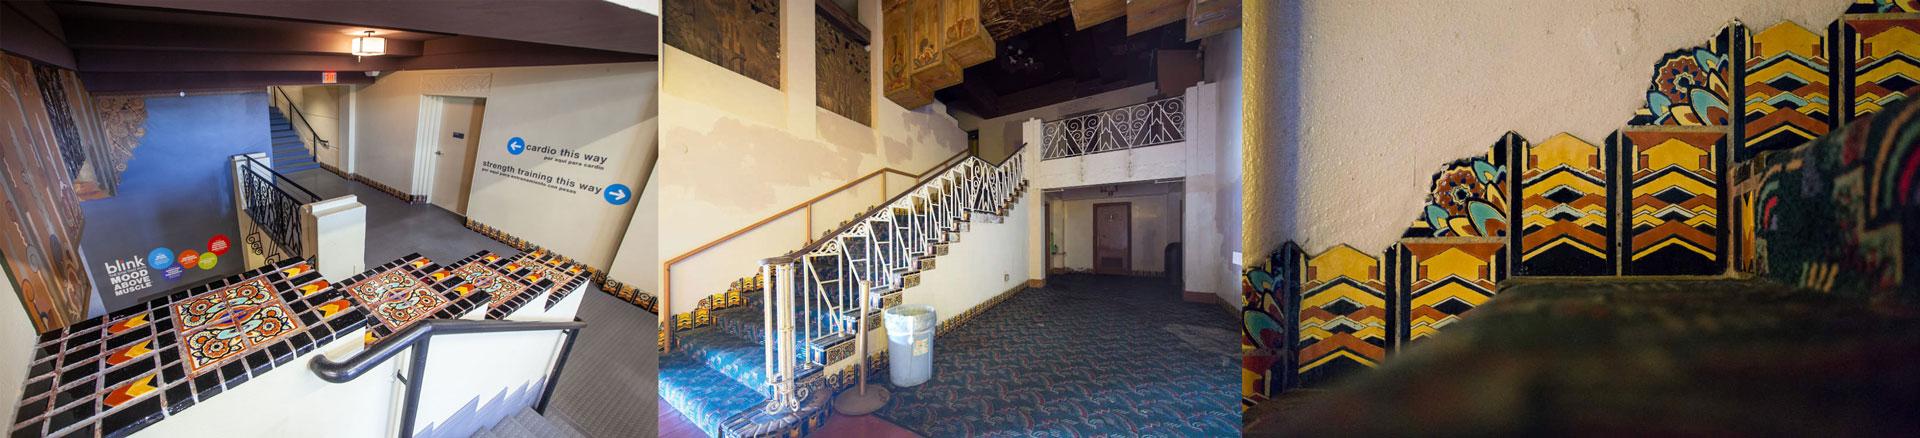 Tudor Tile Warner Theater